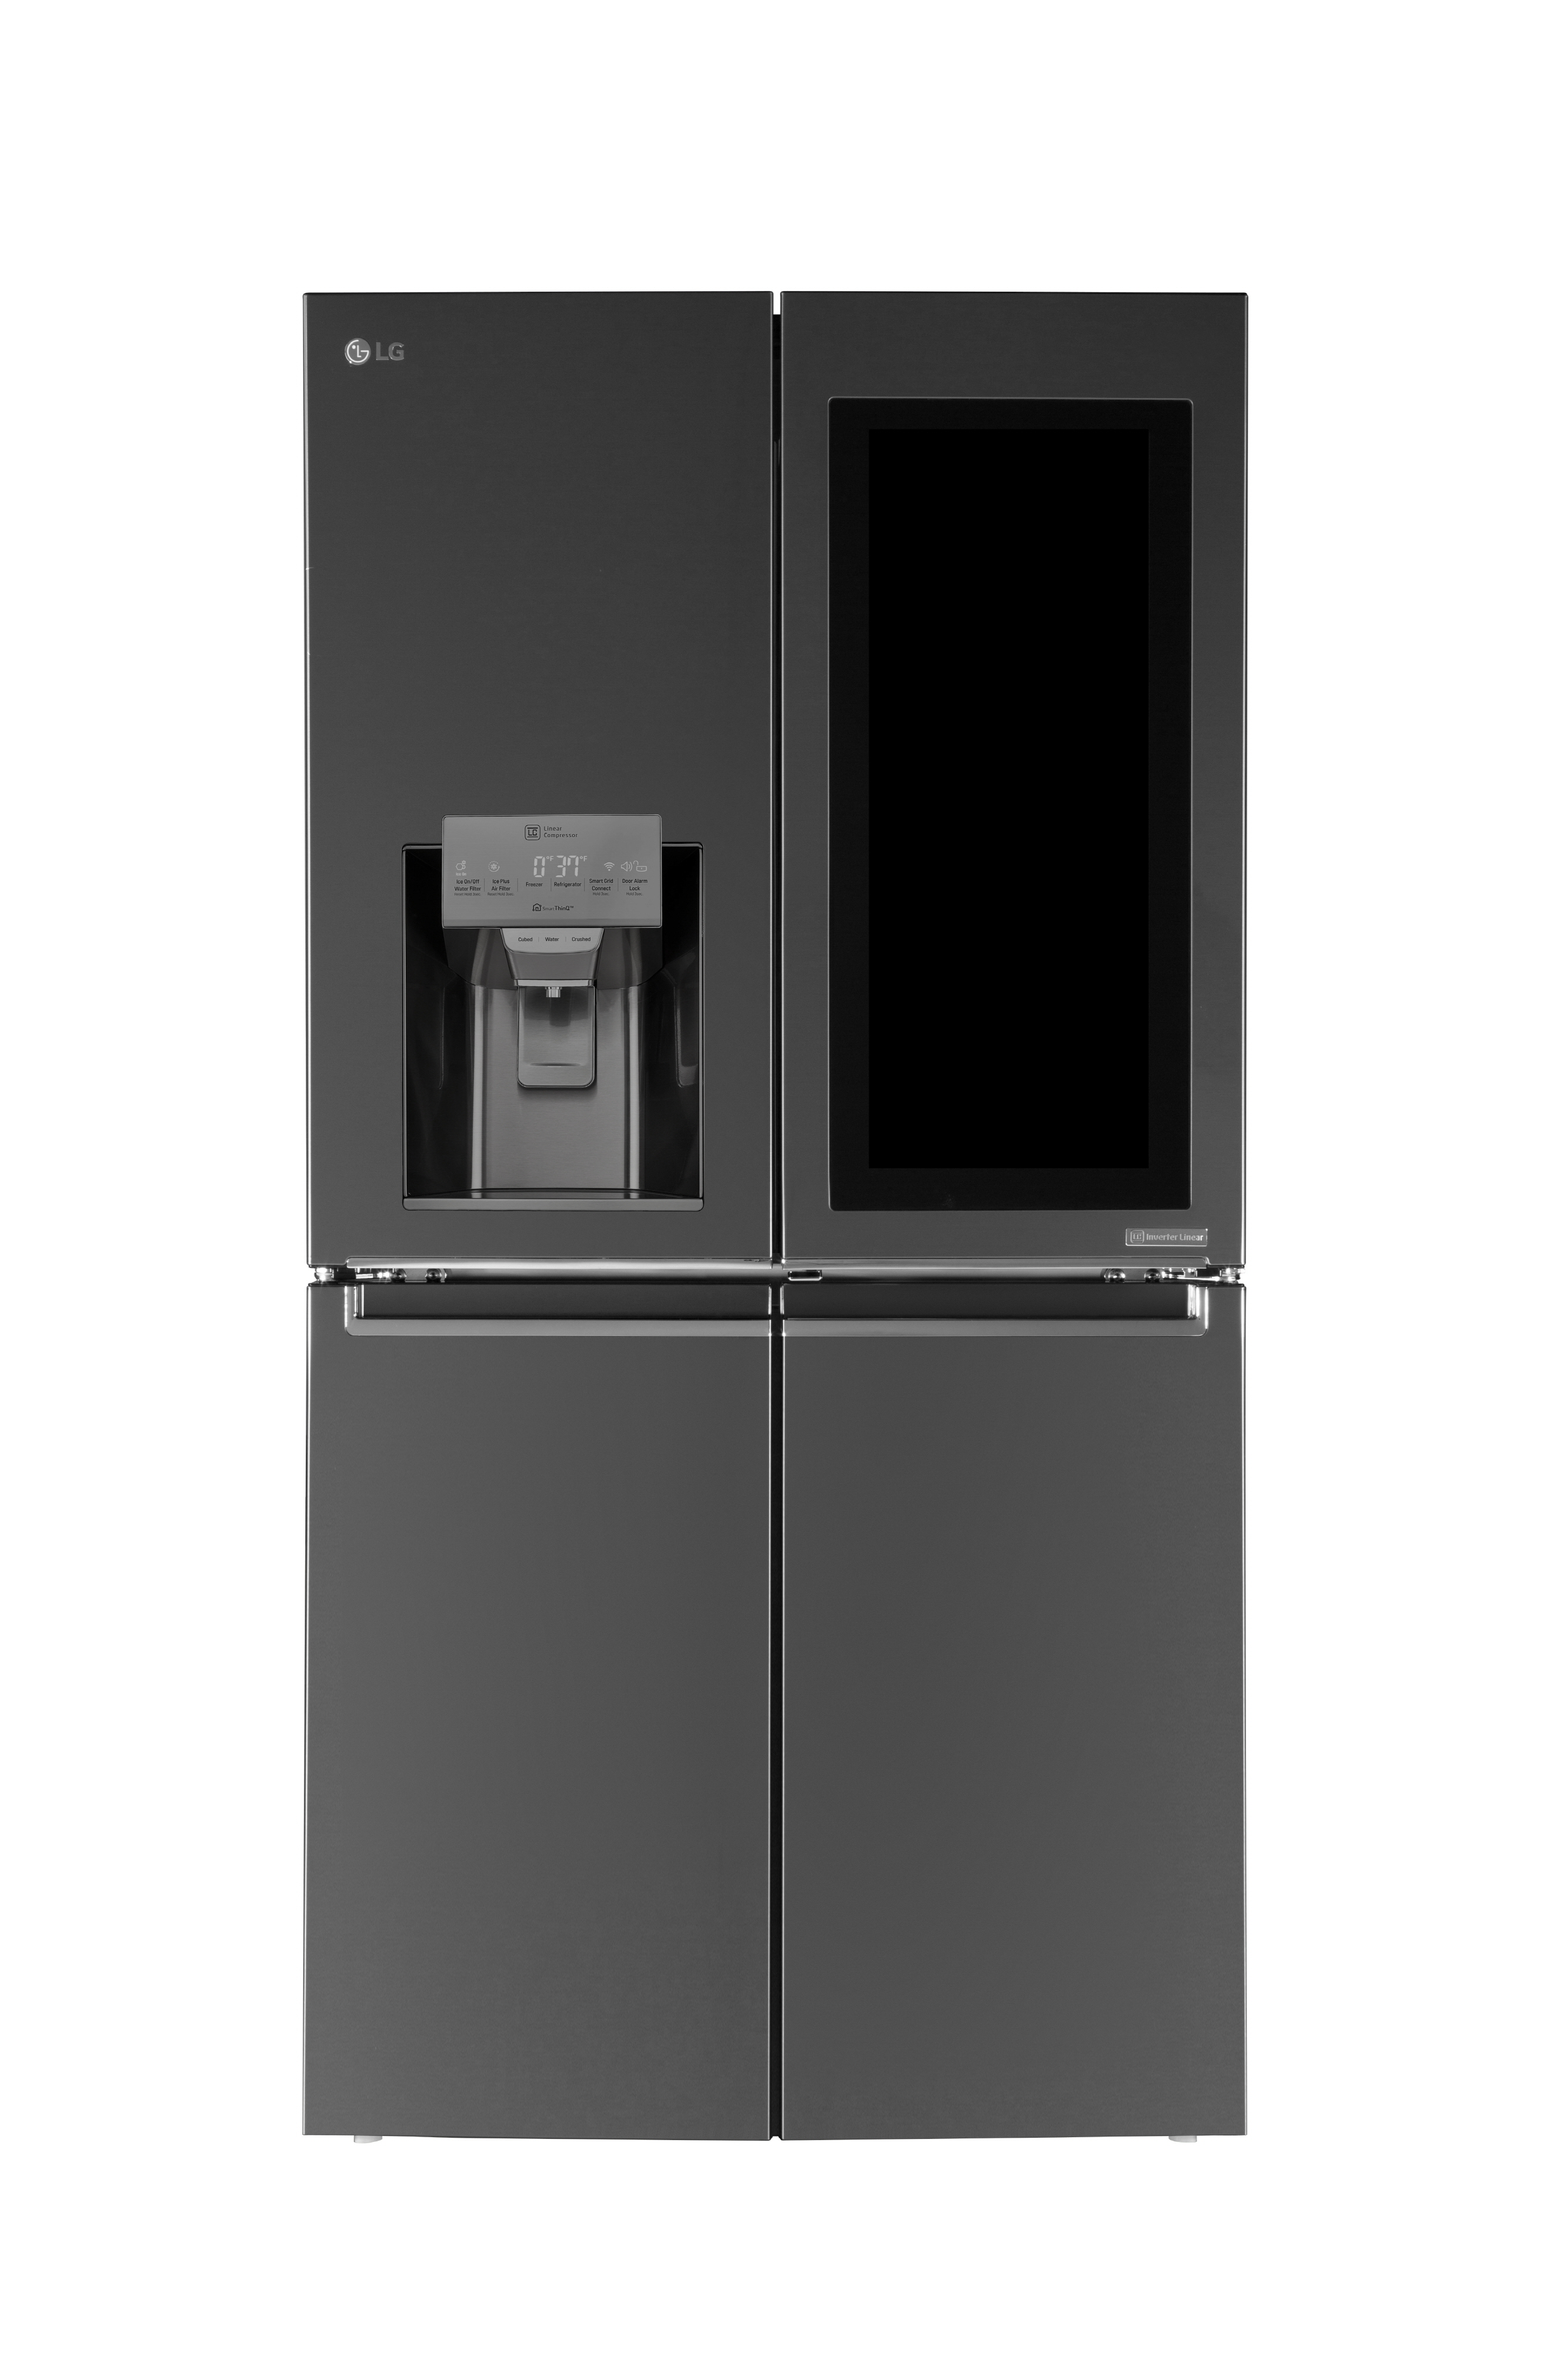 LG Smart nstaview Refrigerator